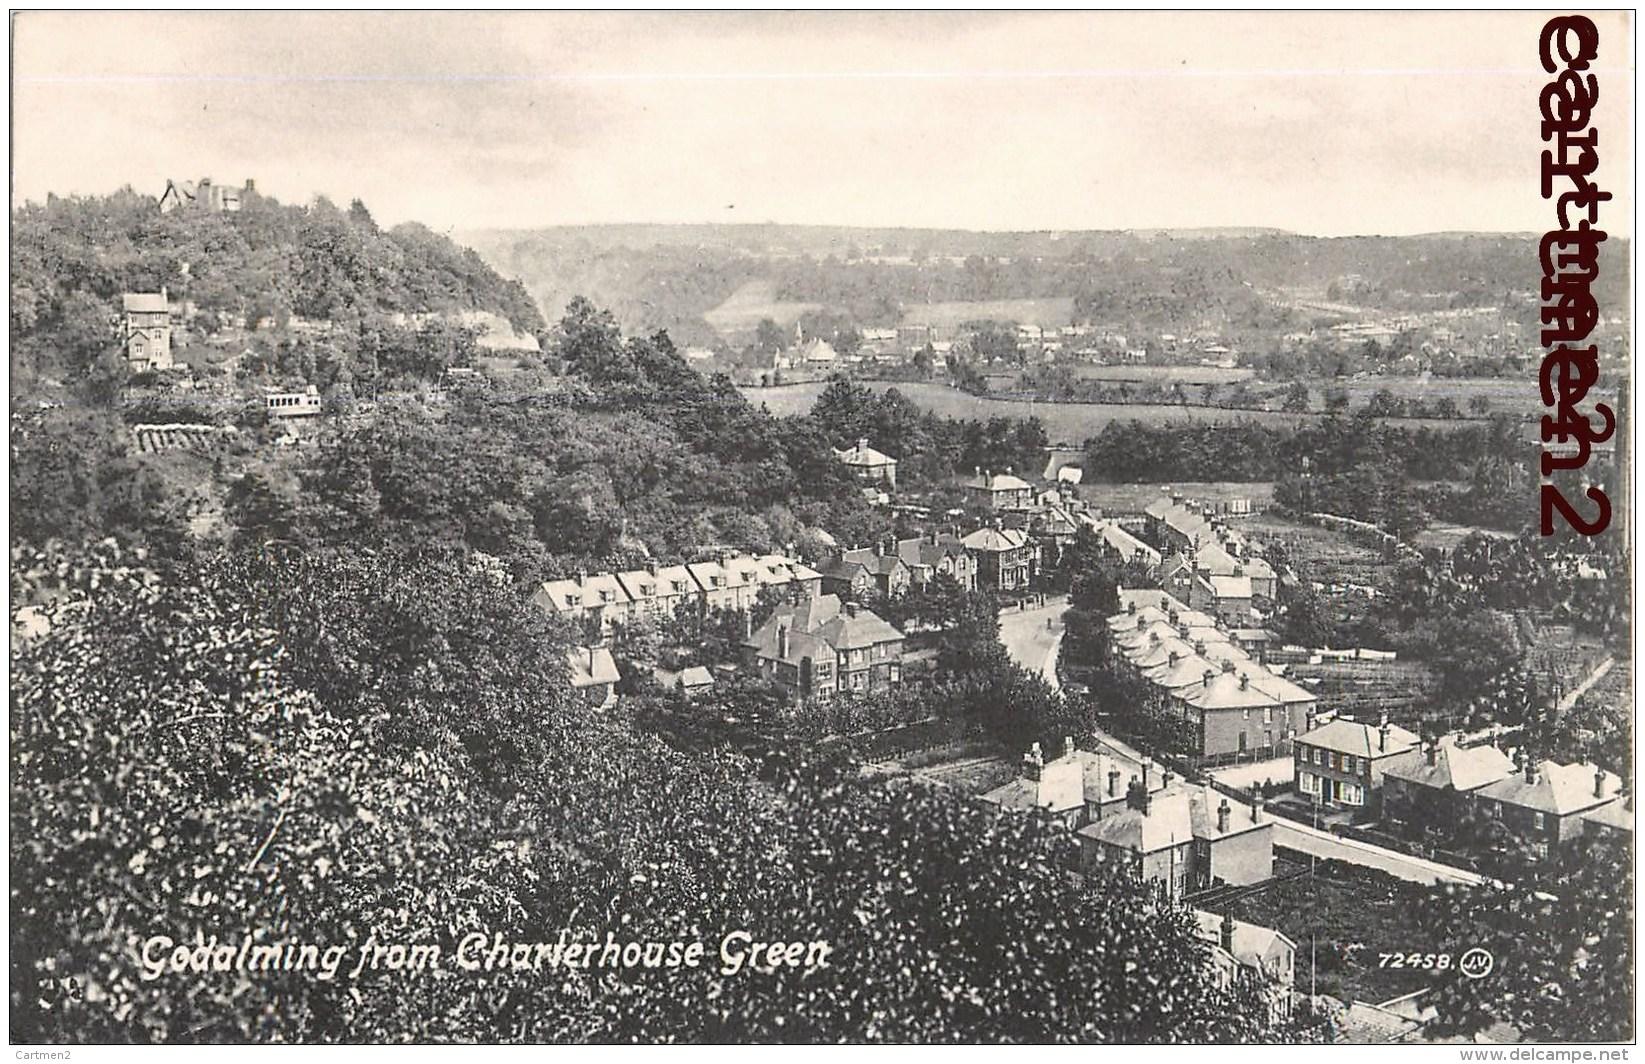 GODALMING FROM CHARTERHOUSE GREEN SURREY ENGLAND - Surrey